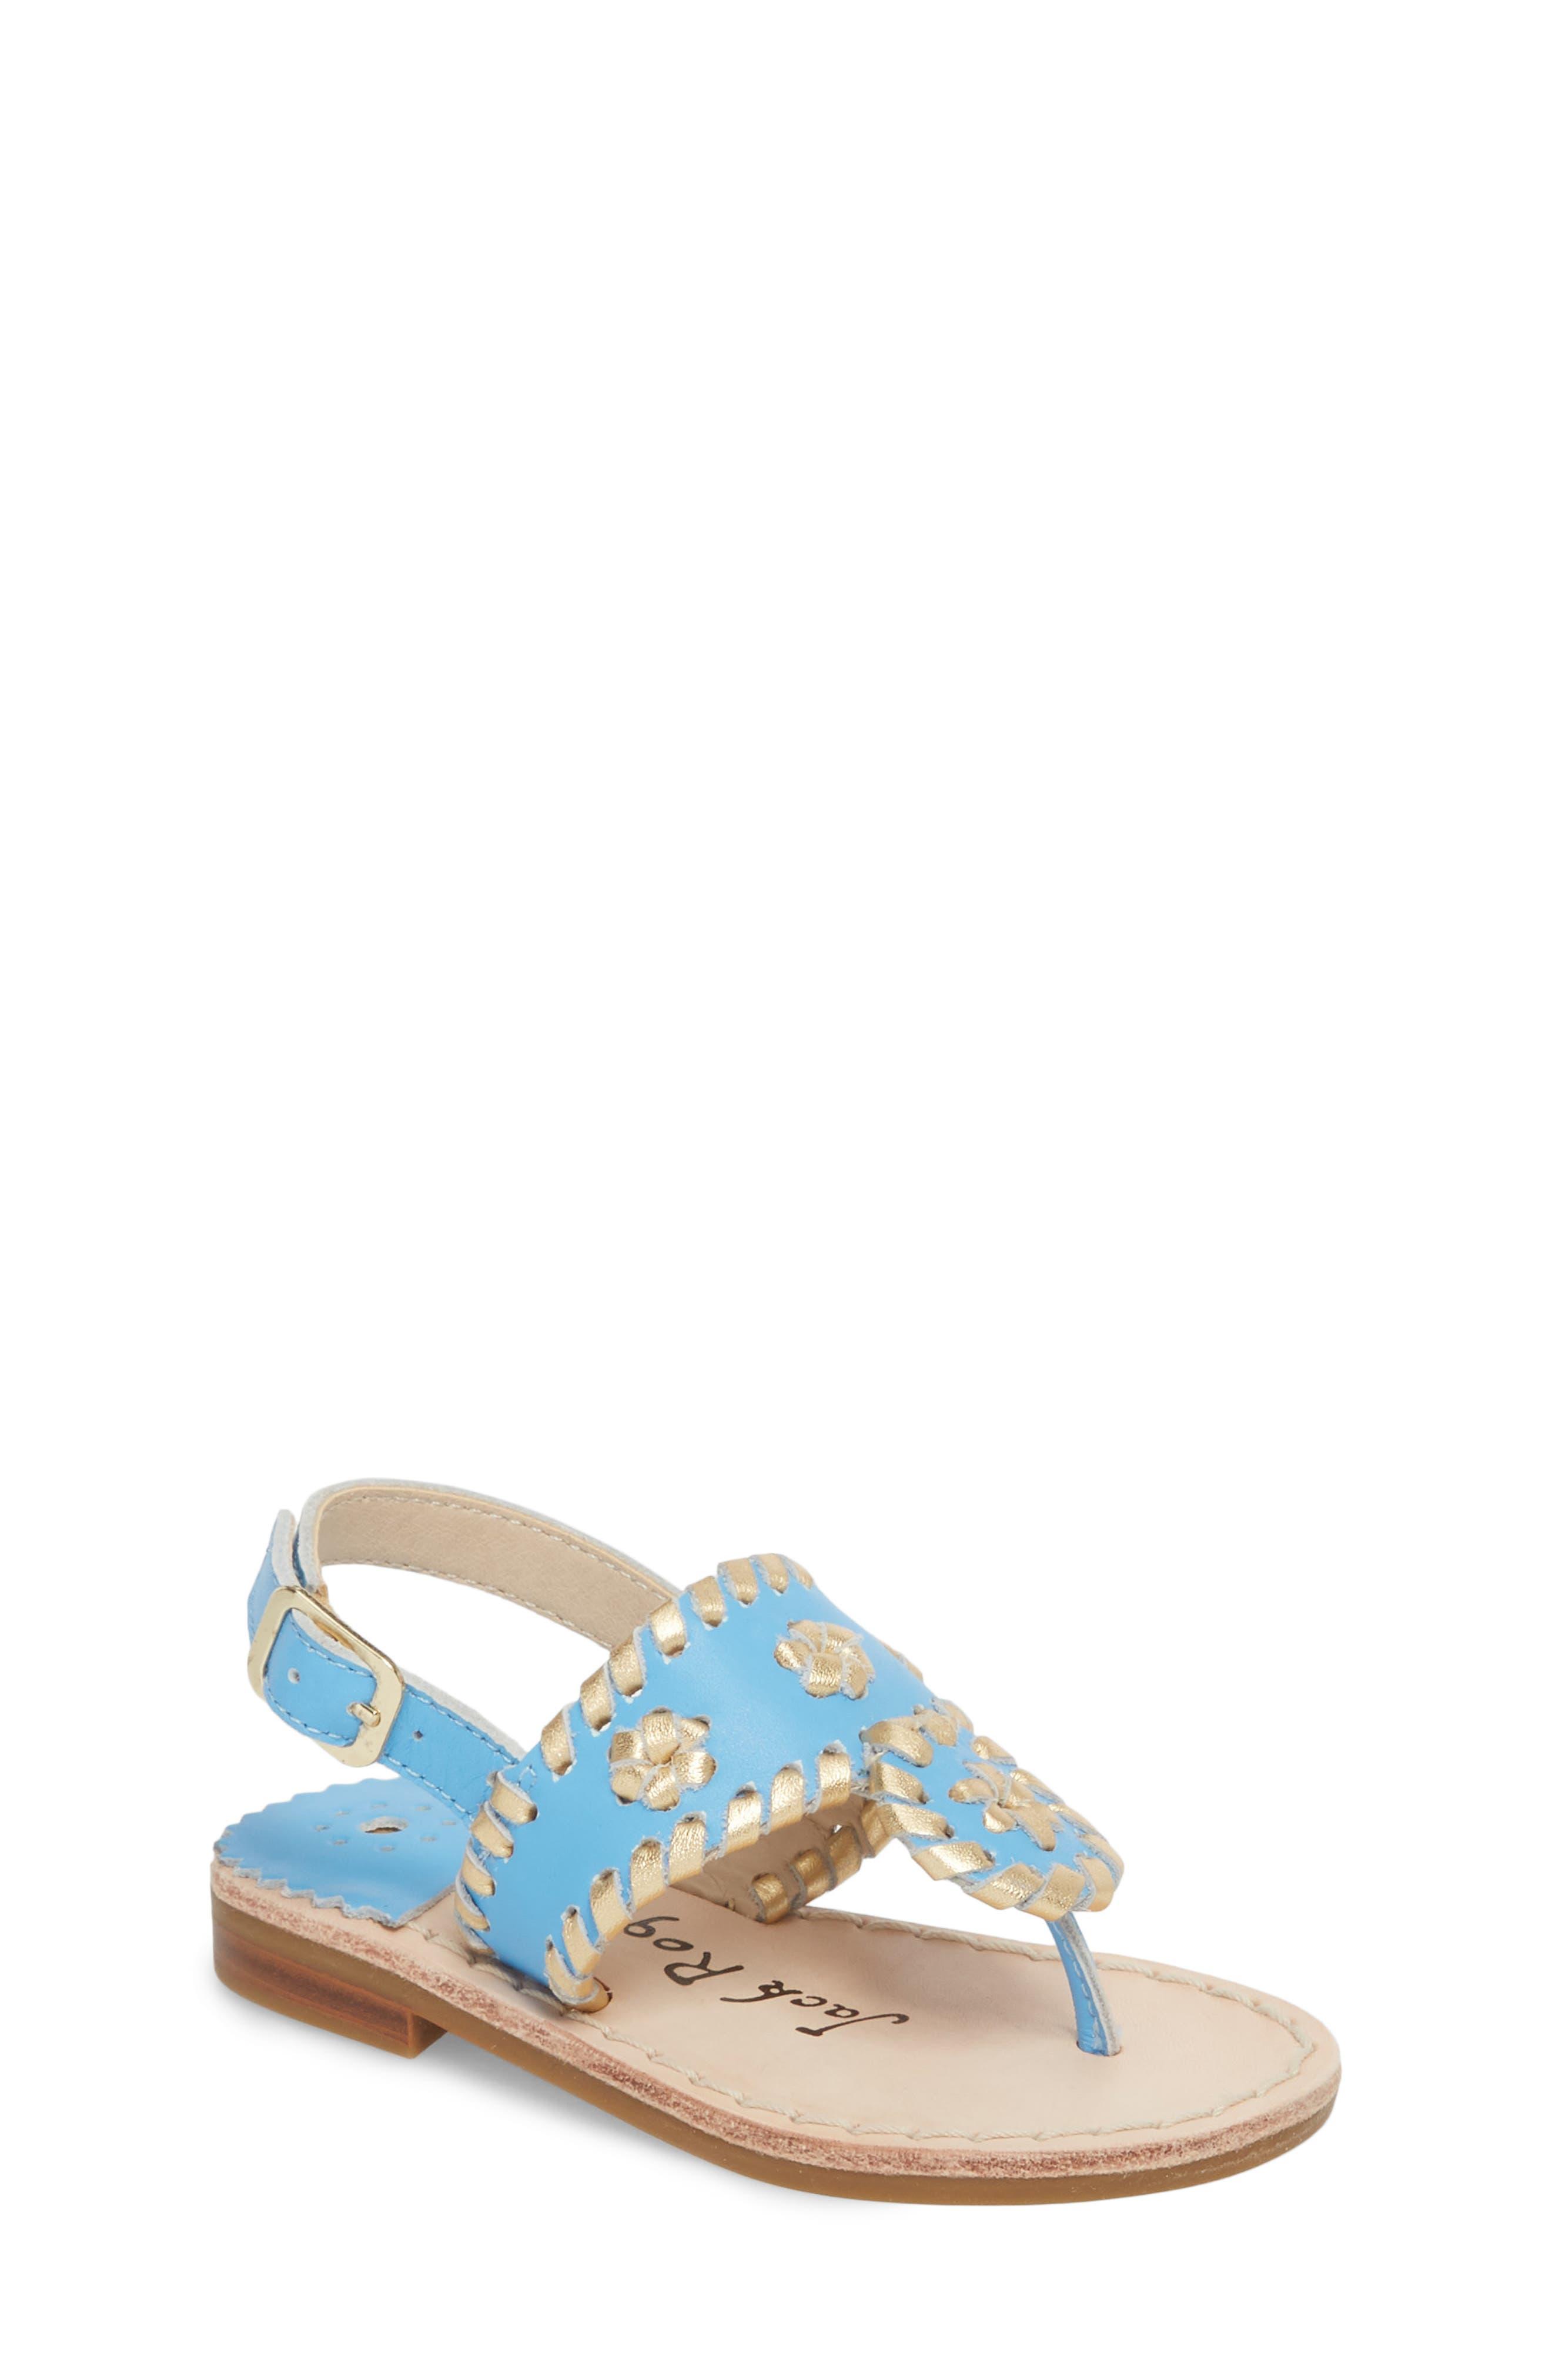 Little Miss Hollis Metallic Trim Sandal,                         Main,                         color, FRENCH BLUE/ GOLD LEATHER